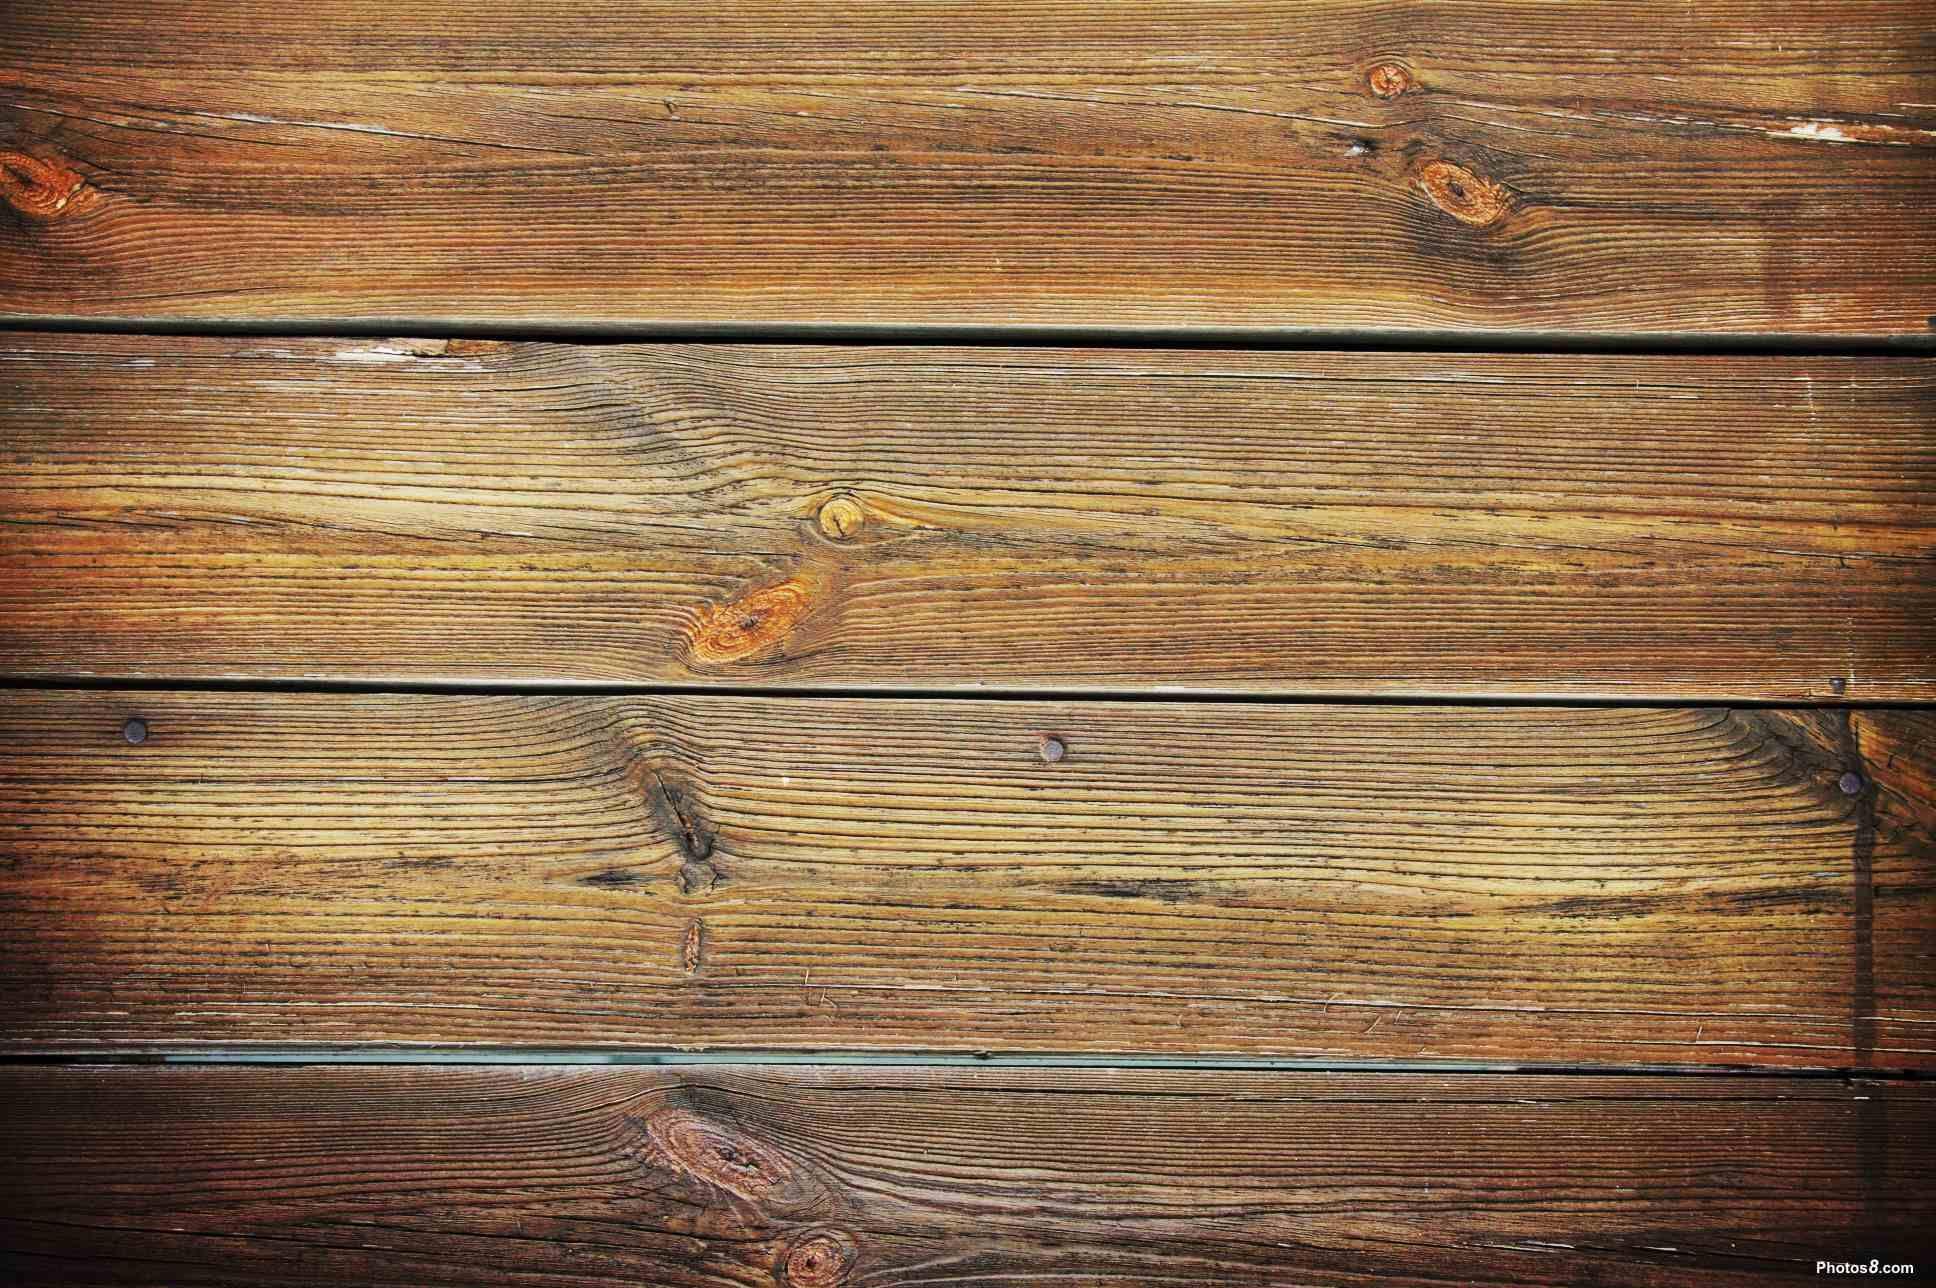 Stock Photos Photos8 Royalty Free Stock Photography Wood Grain Wallpaper Wood Wallpaper Wood Slat Wall